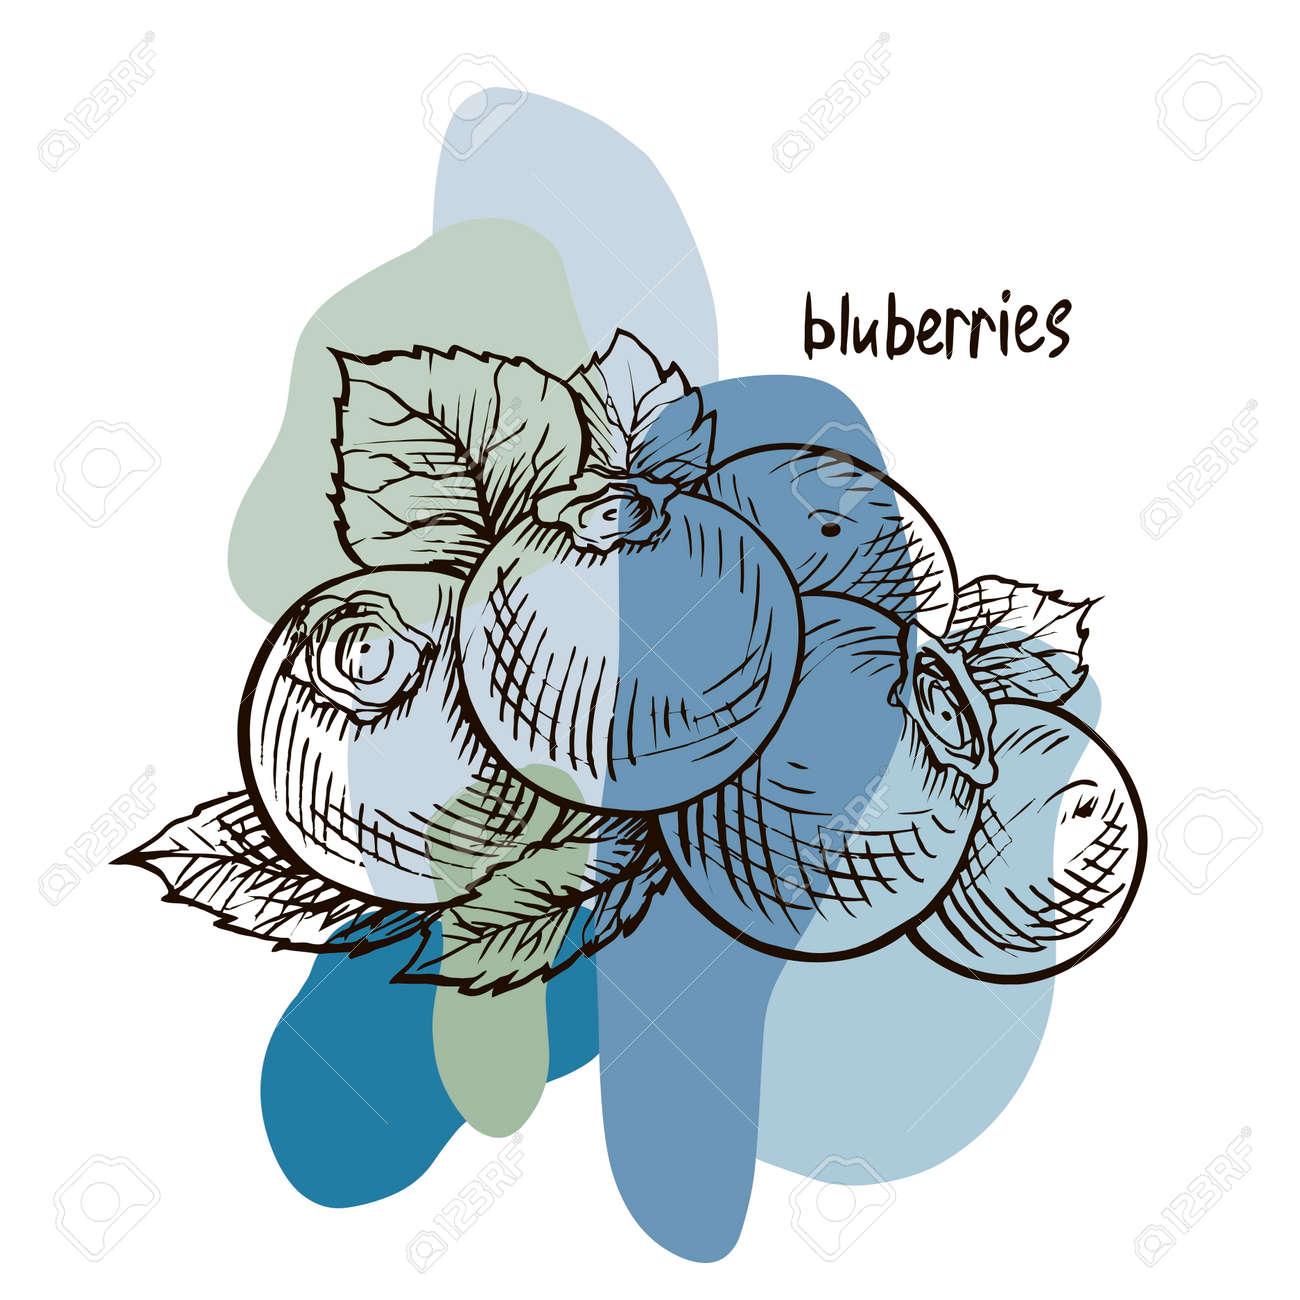 Blueberries. Hand drawn illustration. Wild berries set. - 169740879